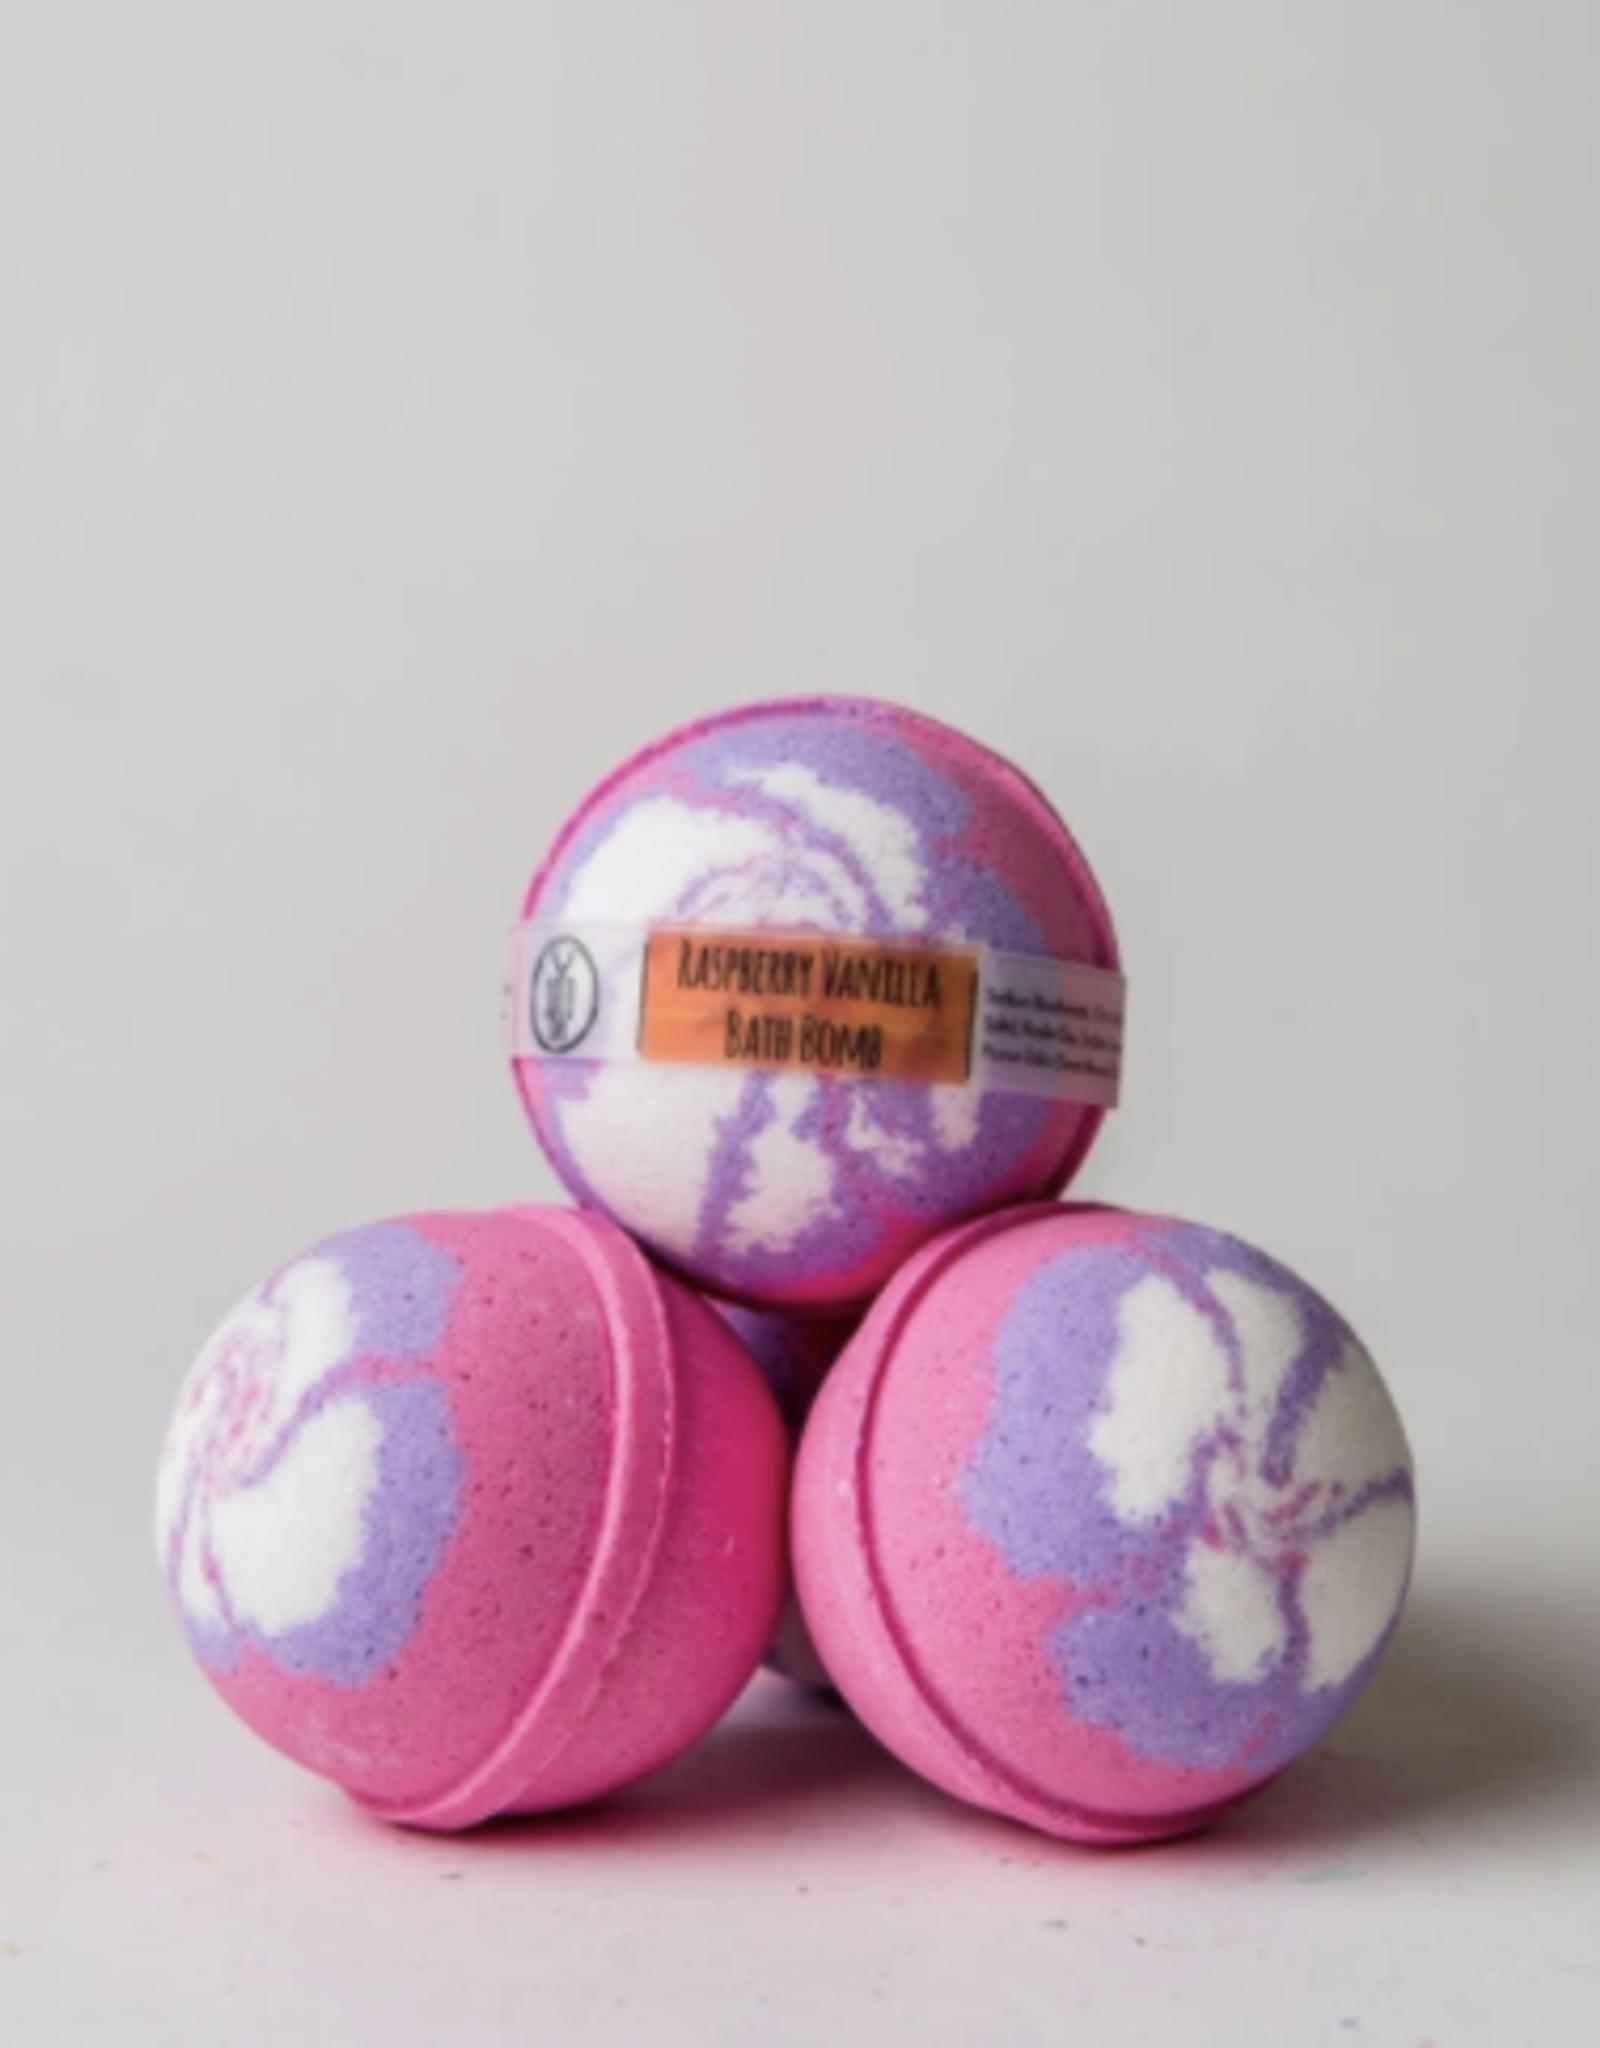 Bath Bombs by Soco Soaps